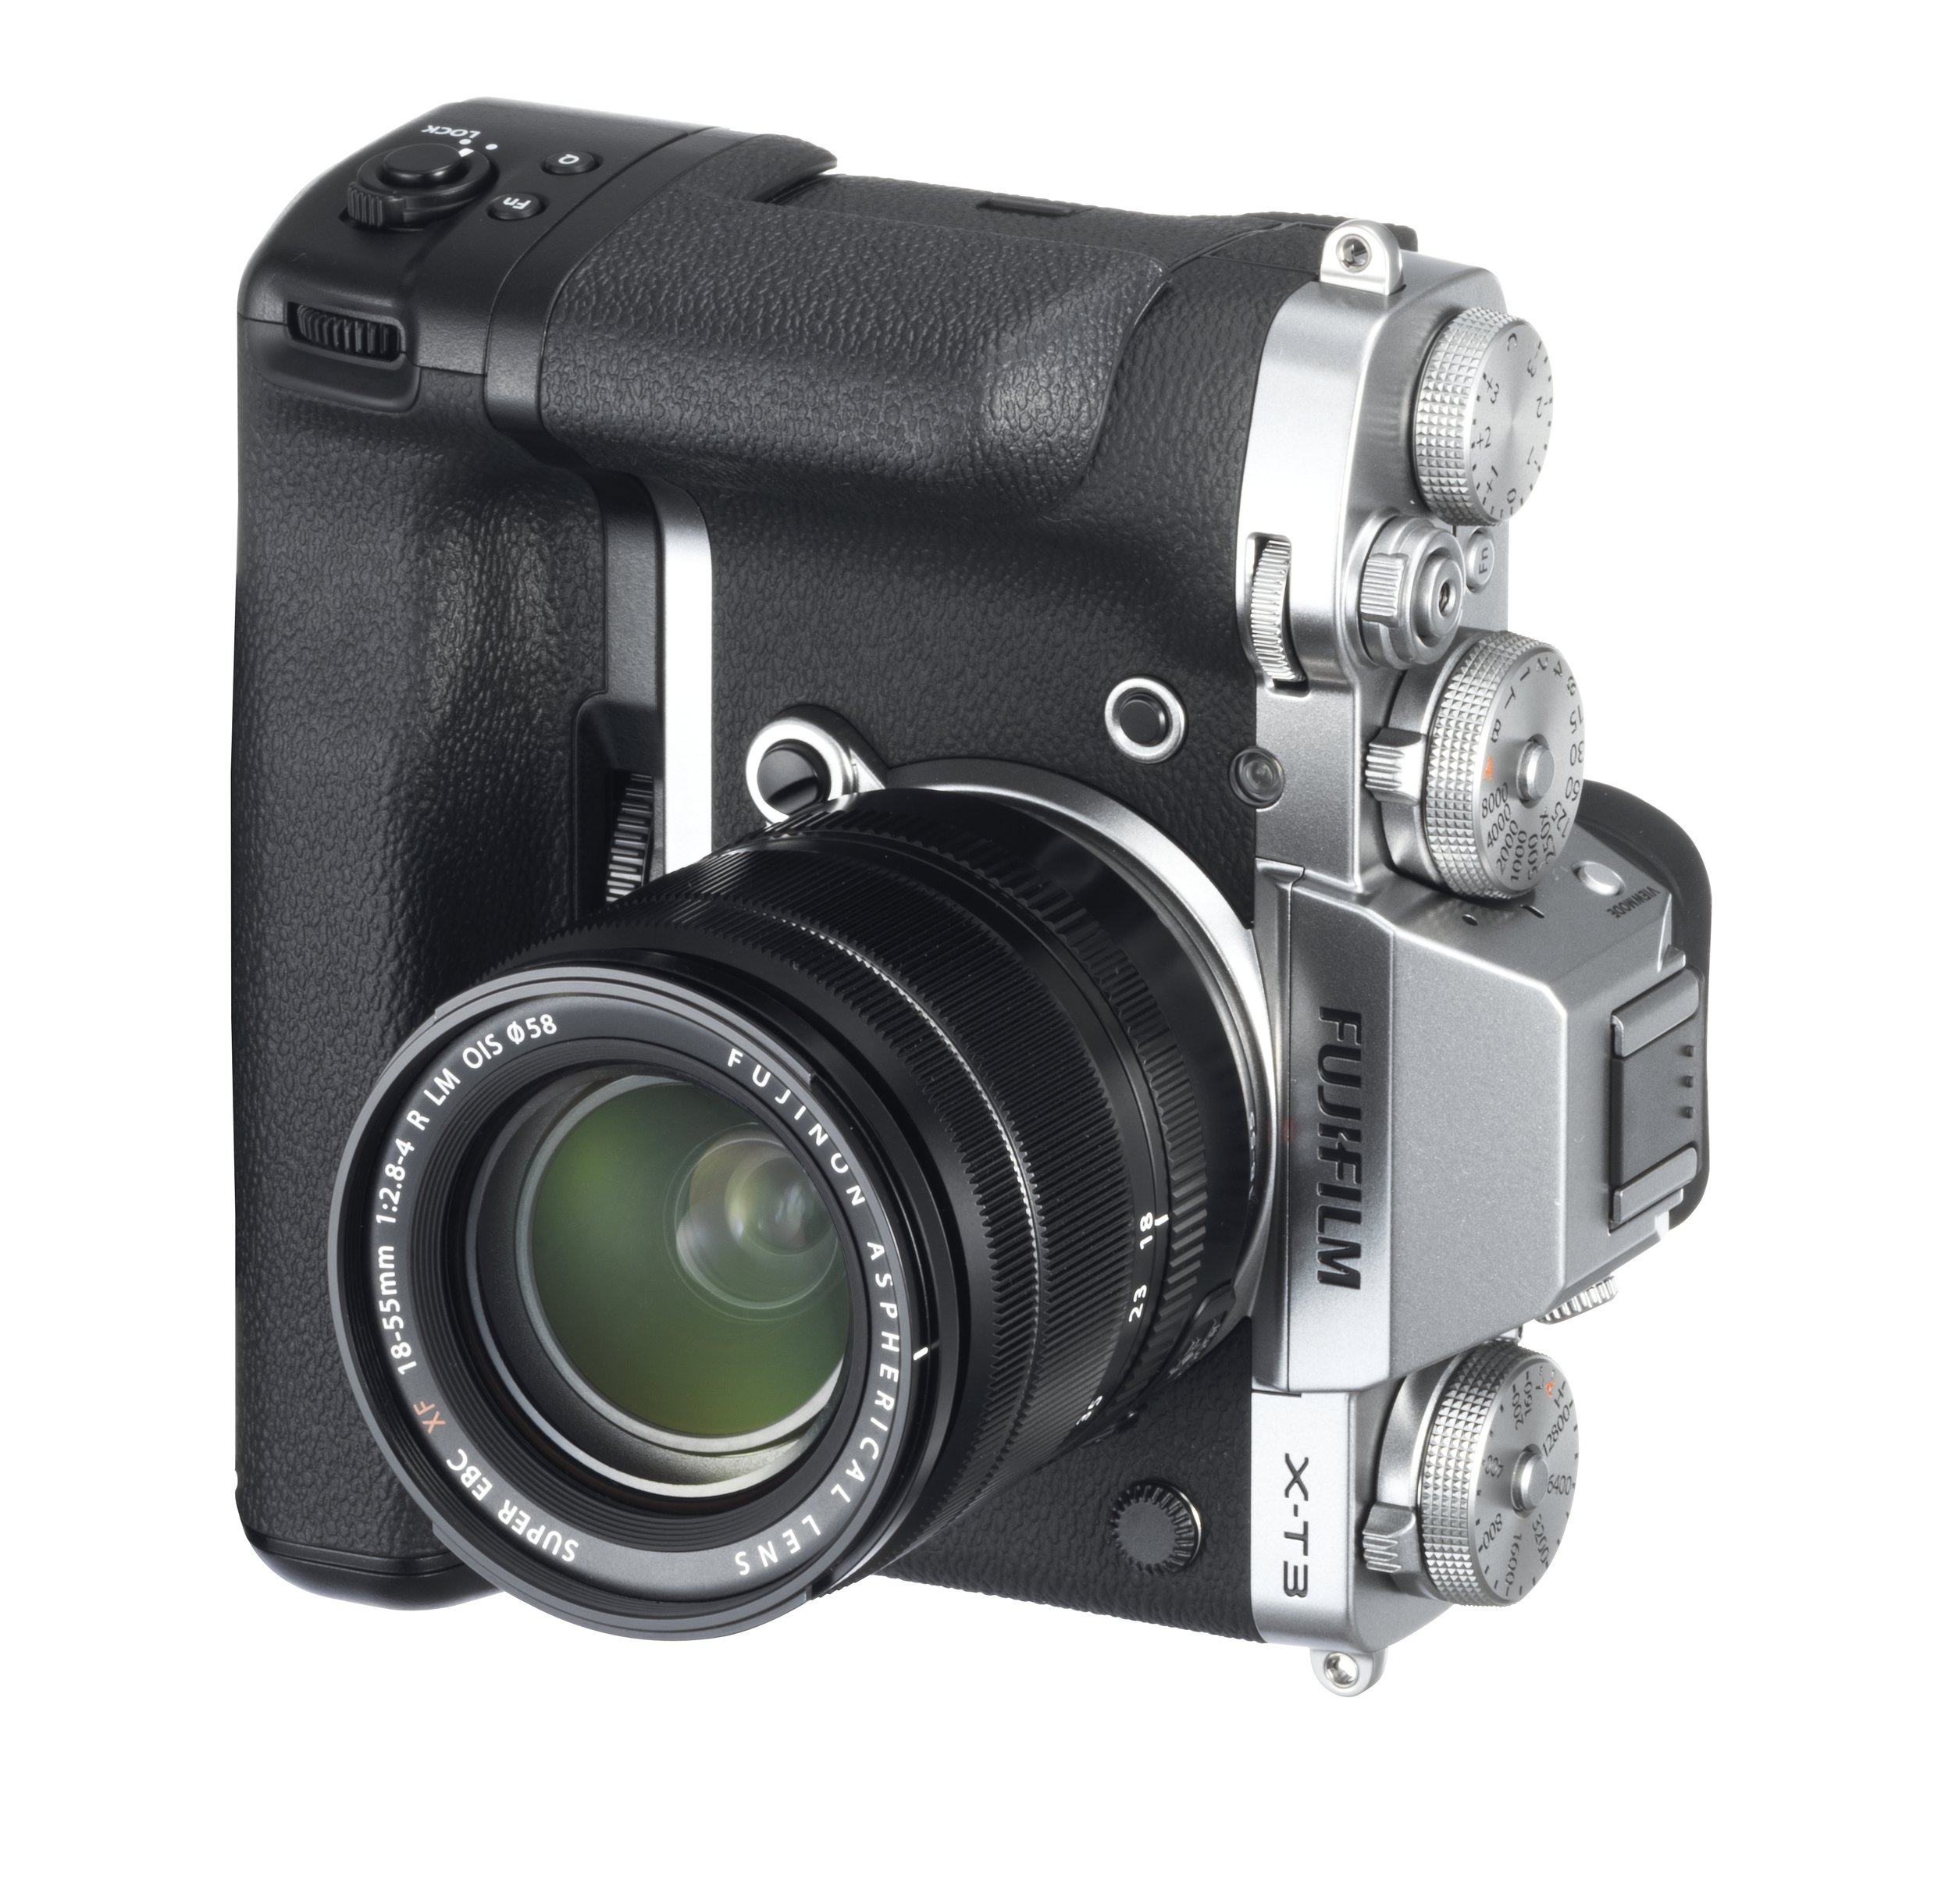 X-T3_Silver_Vertical+VPB-XT3+XF18-55mm.jpg